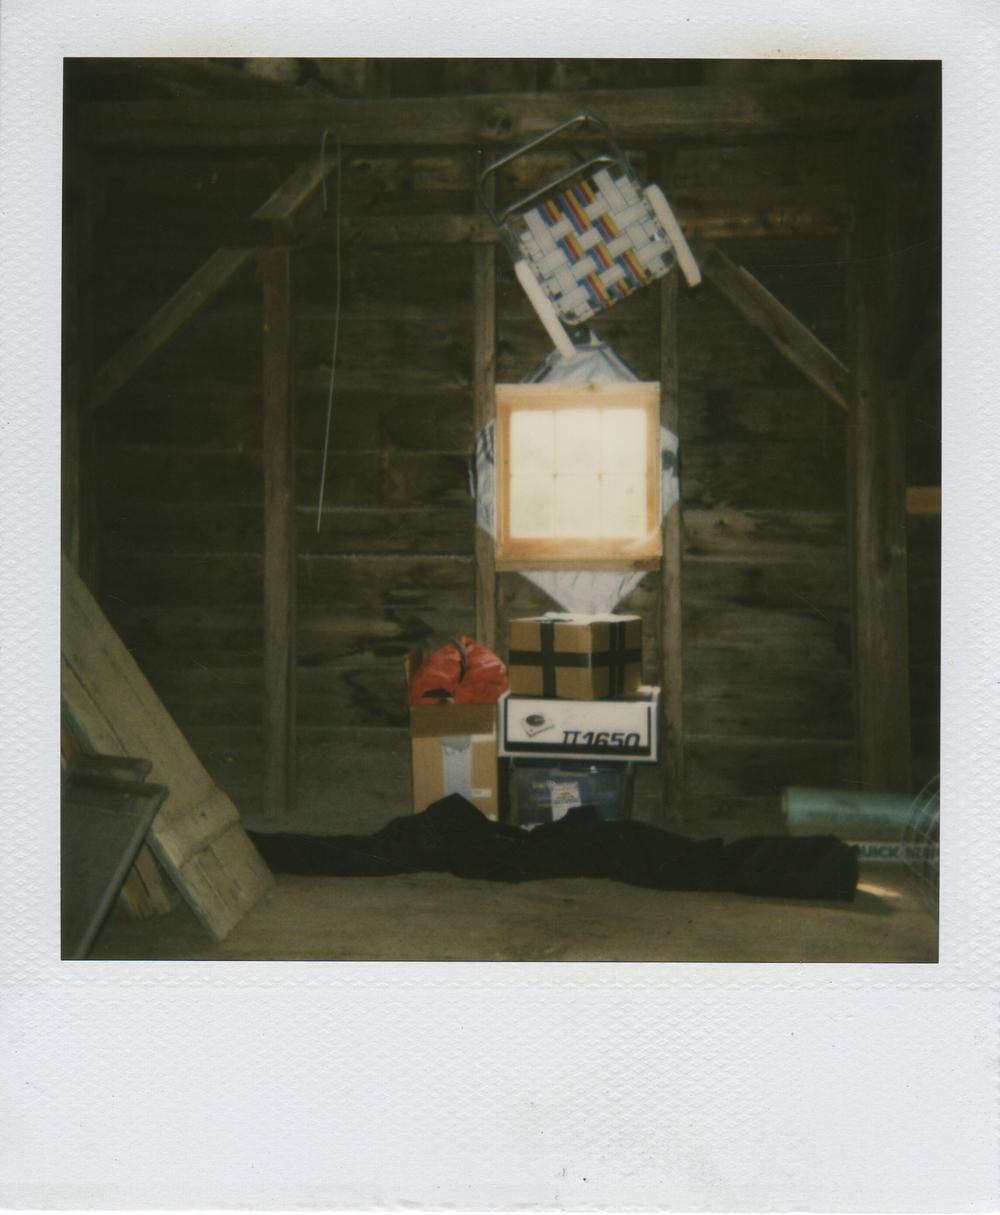 jlaurence-polaroid-022.jpg